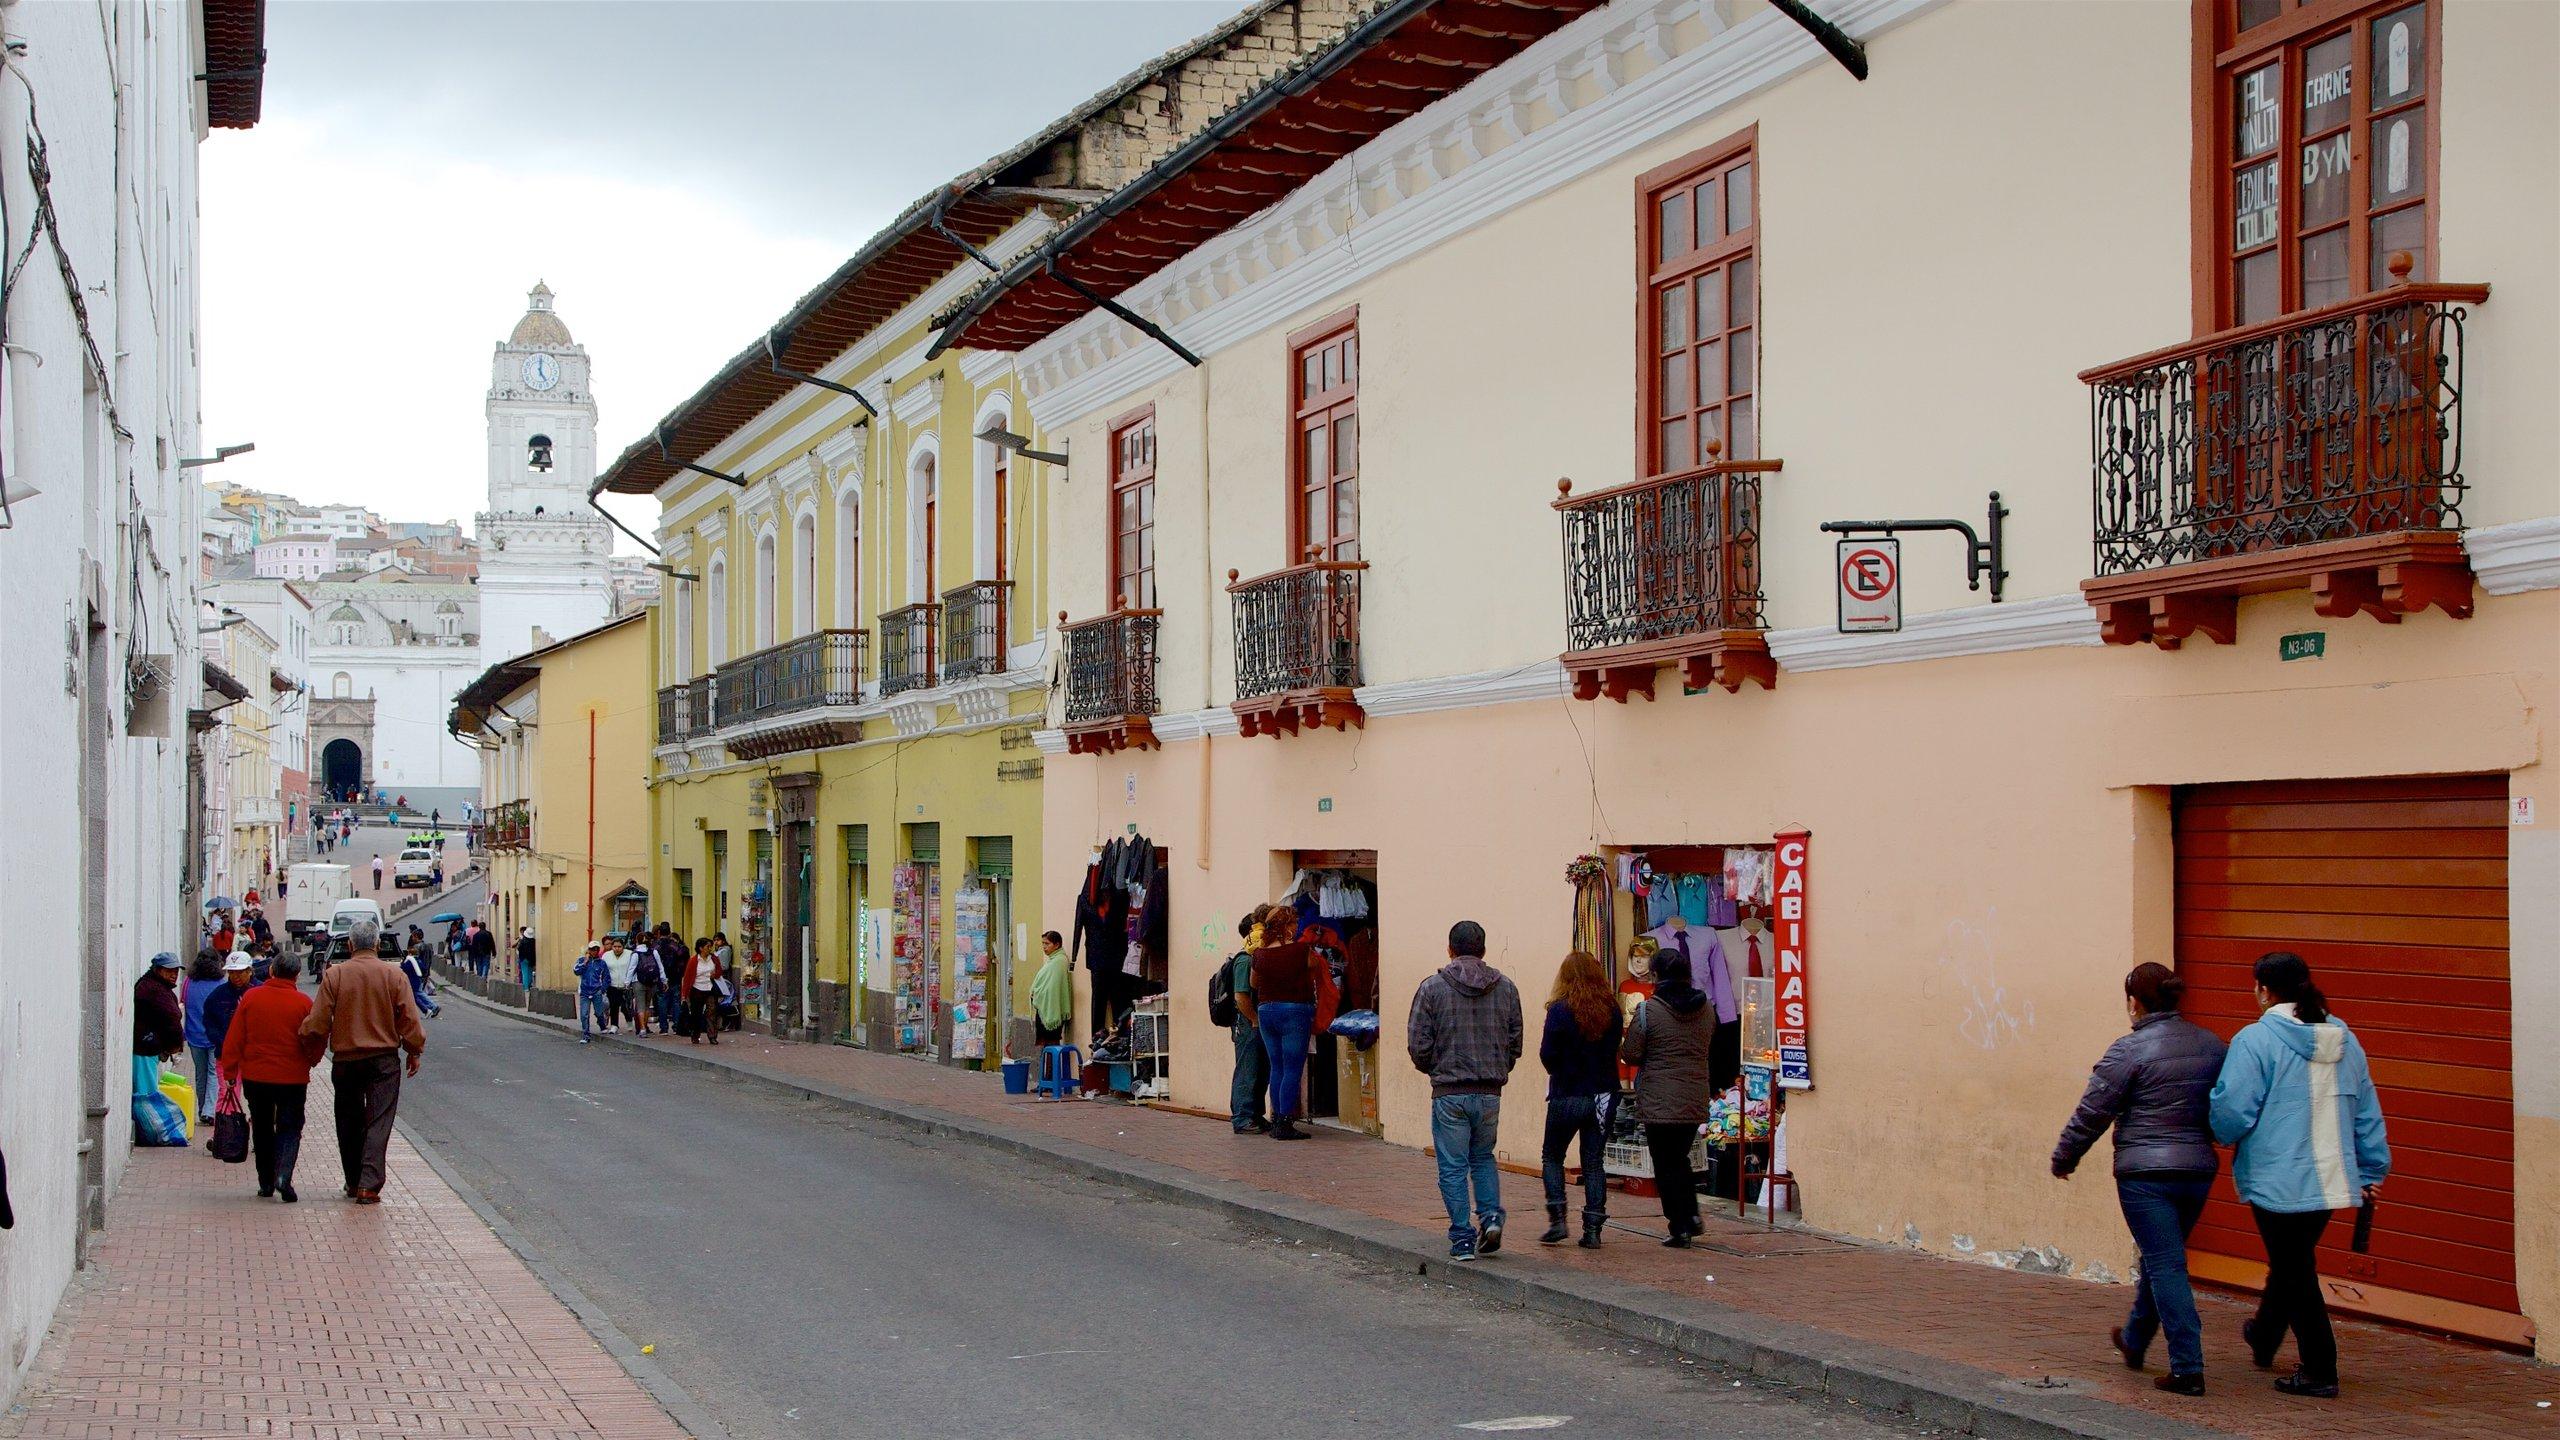 Plaza de San Francisco, Quito, Pichincha, Ecuador